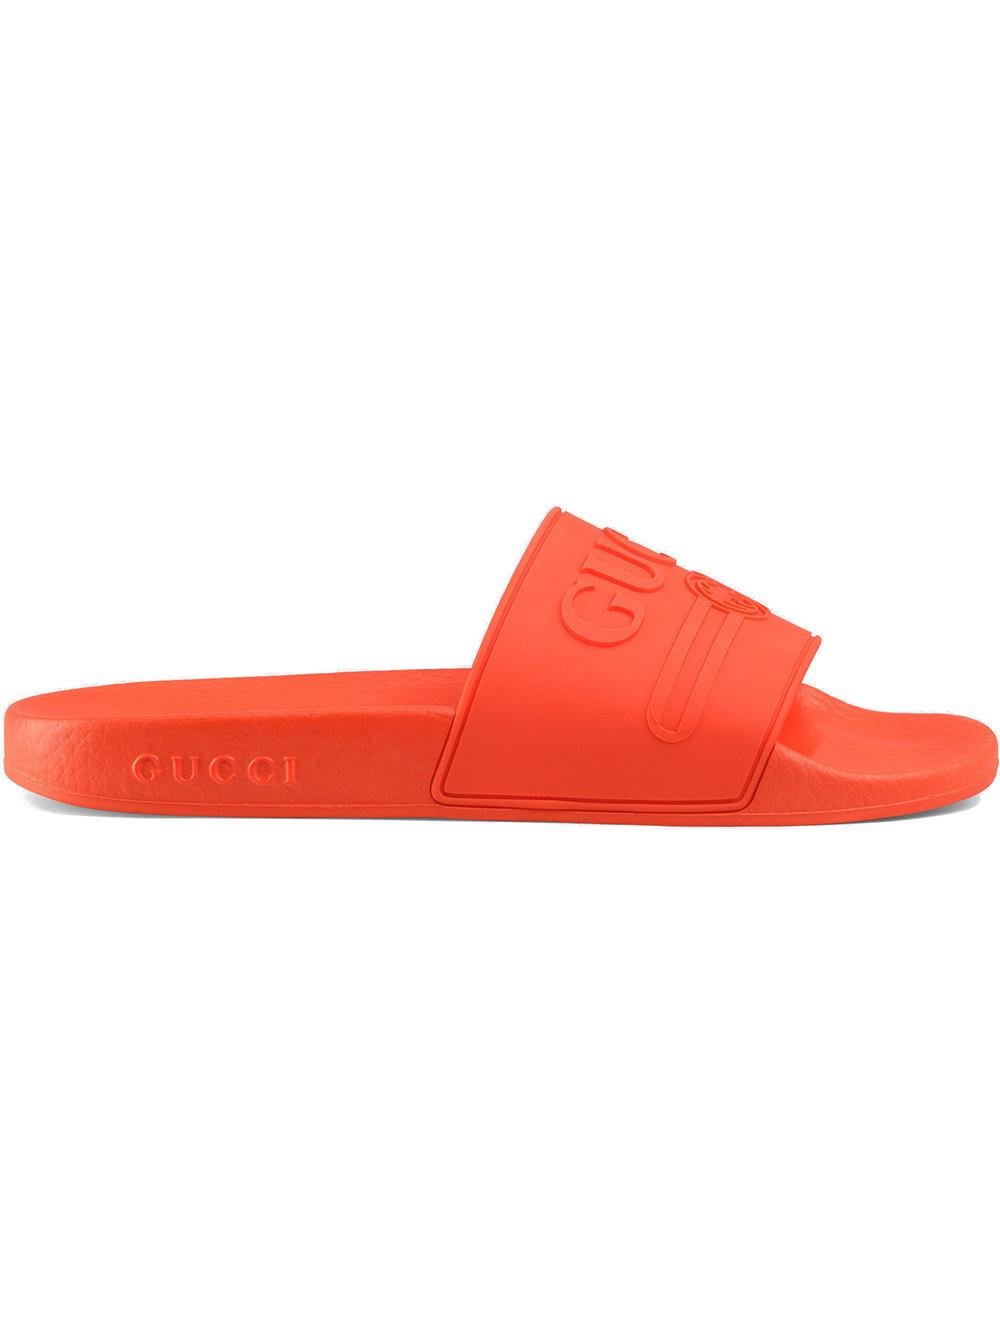 Gucci Gucci logo rubber slide sandals - Yellow - Glami.cz aa4265cf02